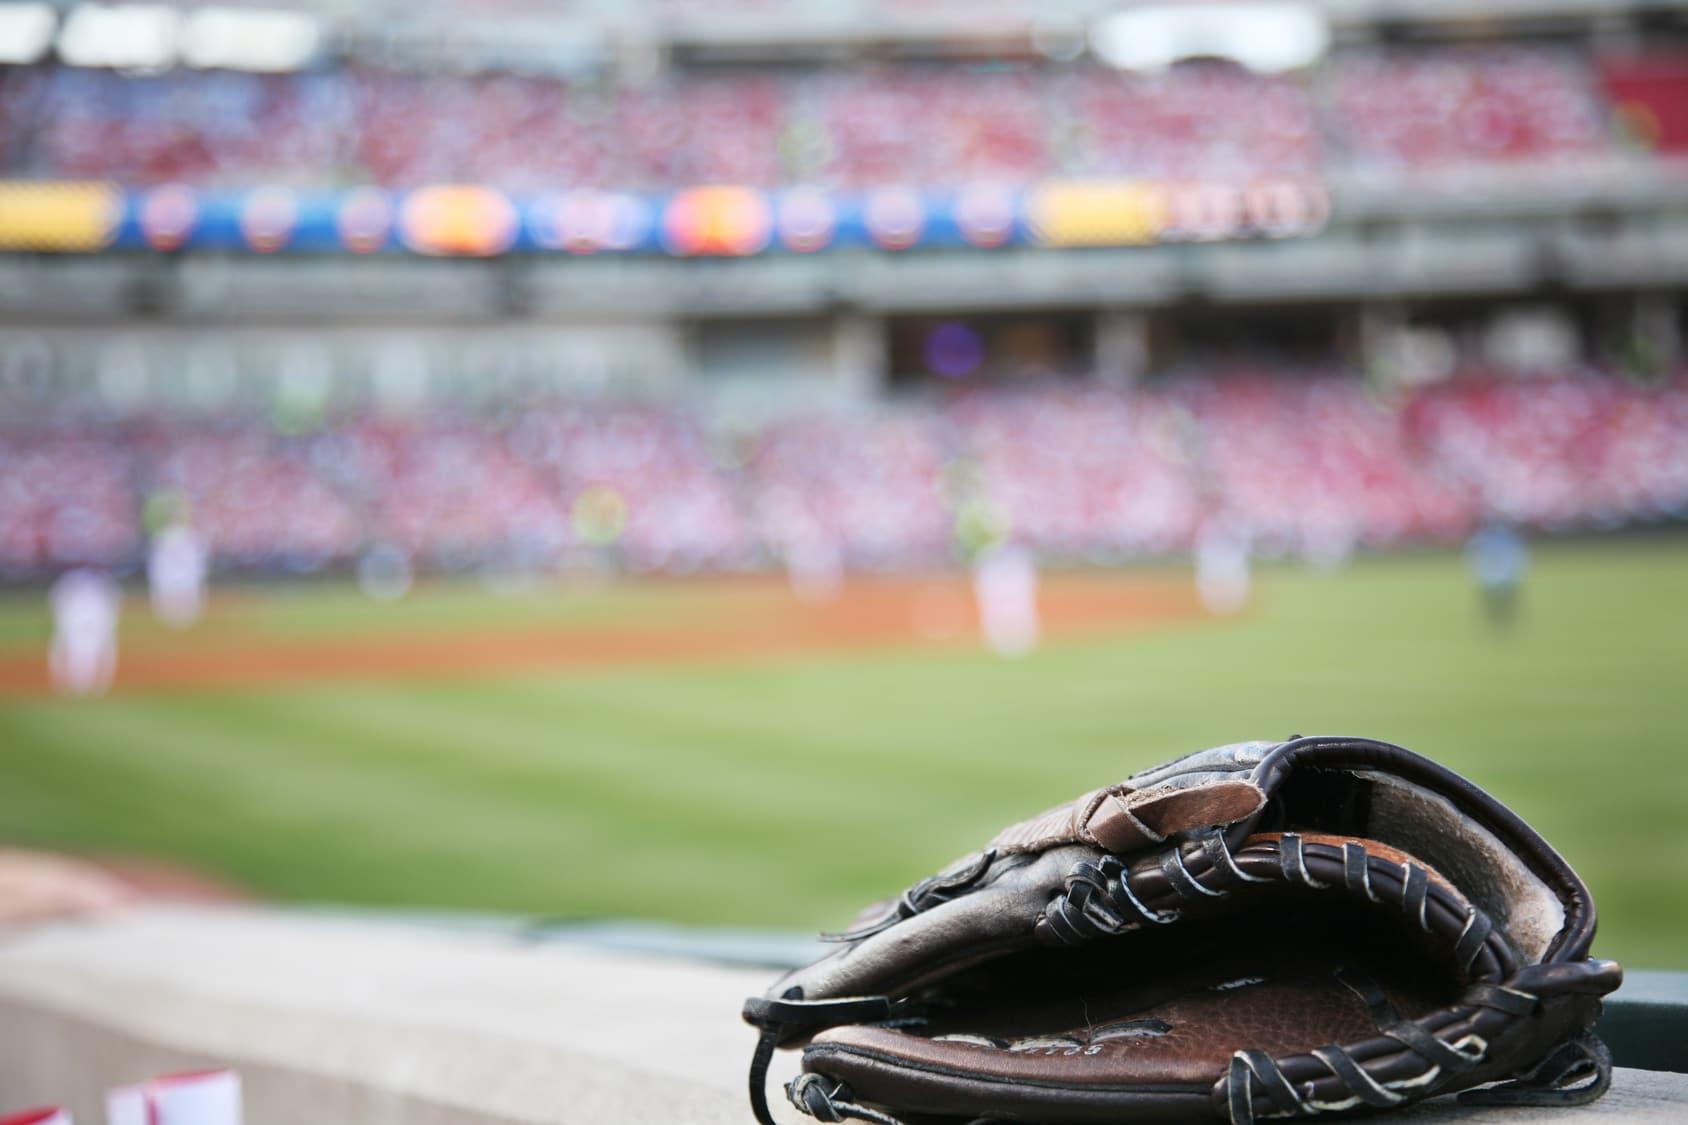 Baseball Glove Oil: How to Break in a Glove